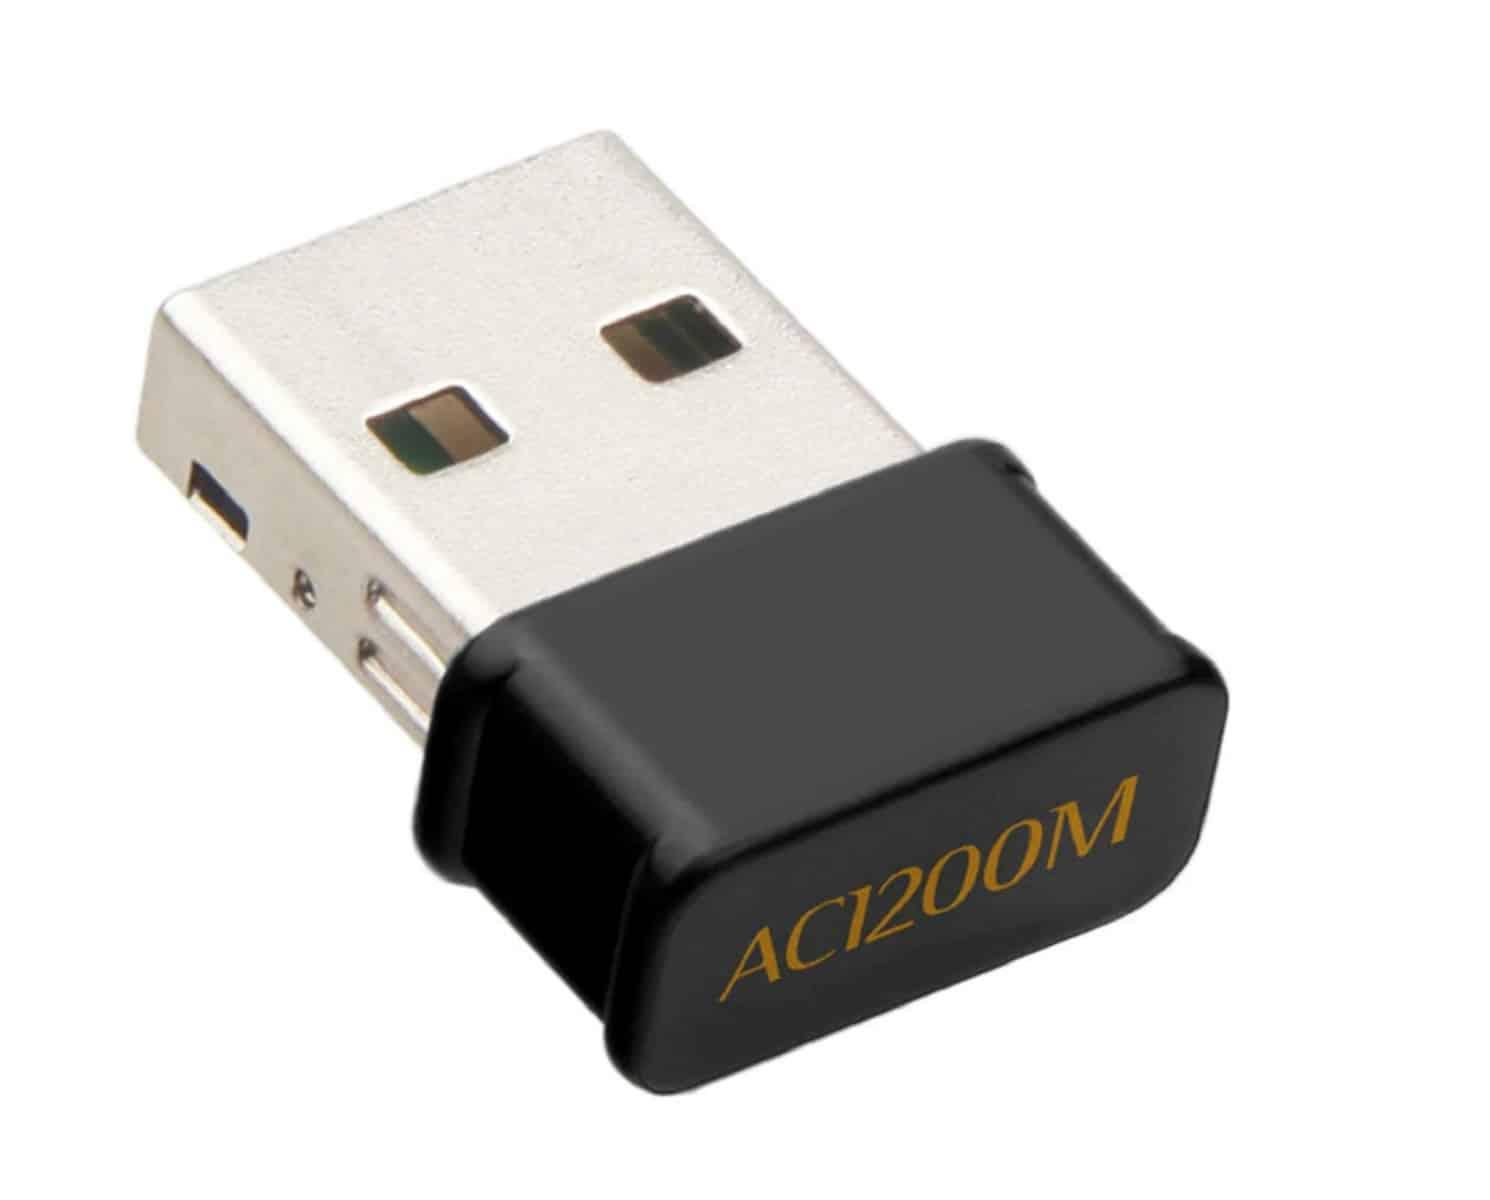 Controlador Mini Wifi Tarjeta Inalambrica Doble Banda USB 2.4G 5G 1200Mbps